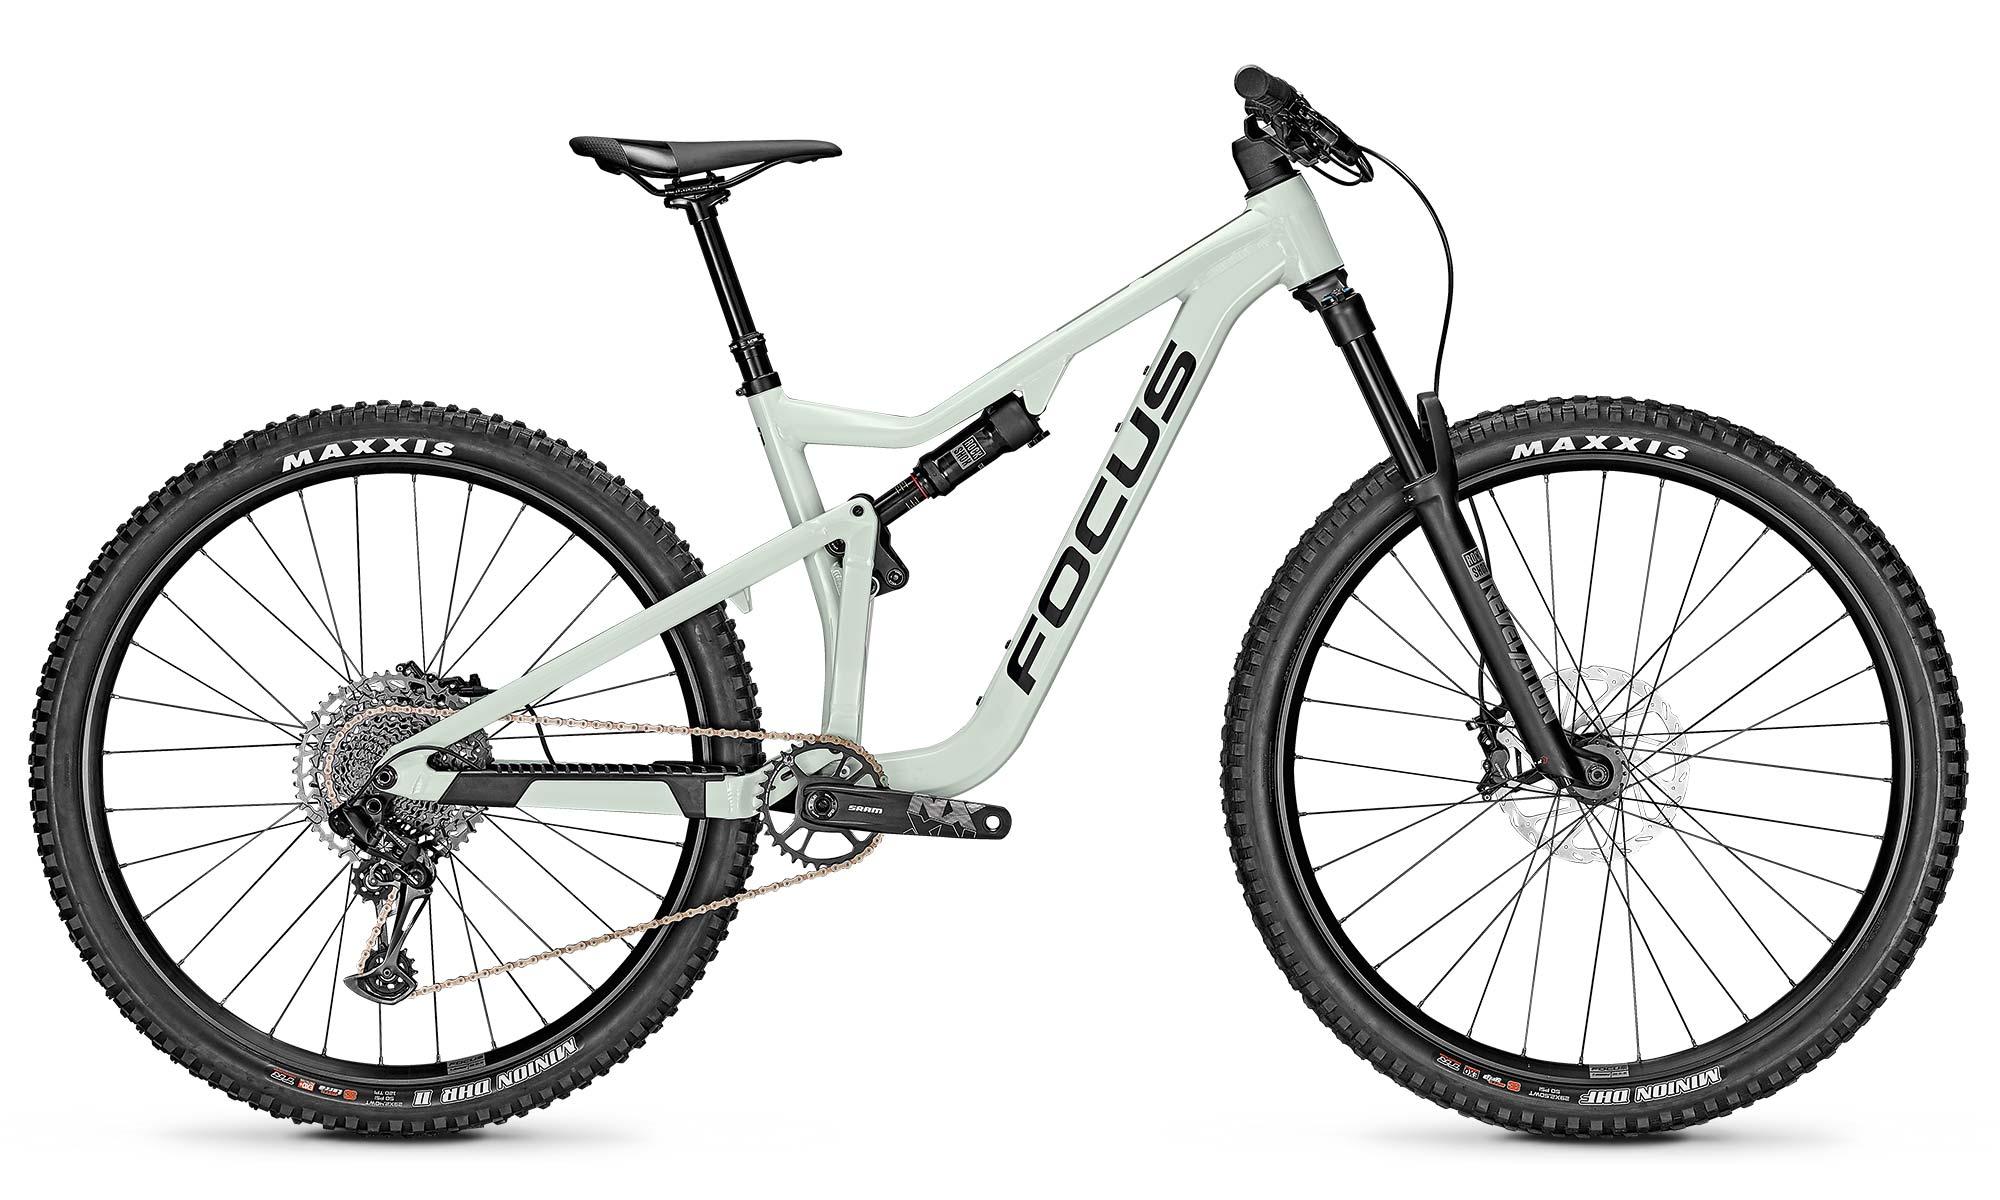 2021 Focus JAM affordable alloy 150mm 29er trail MTB all-mountain bike,6.8 complete